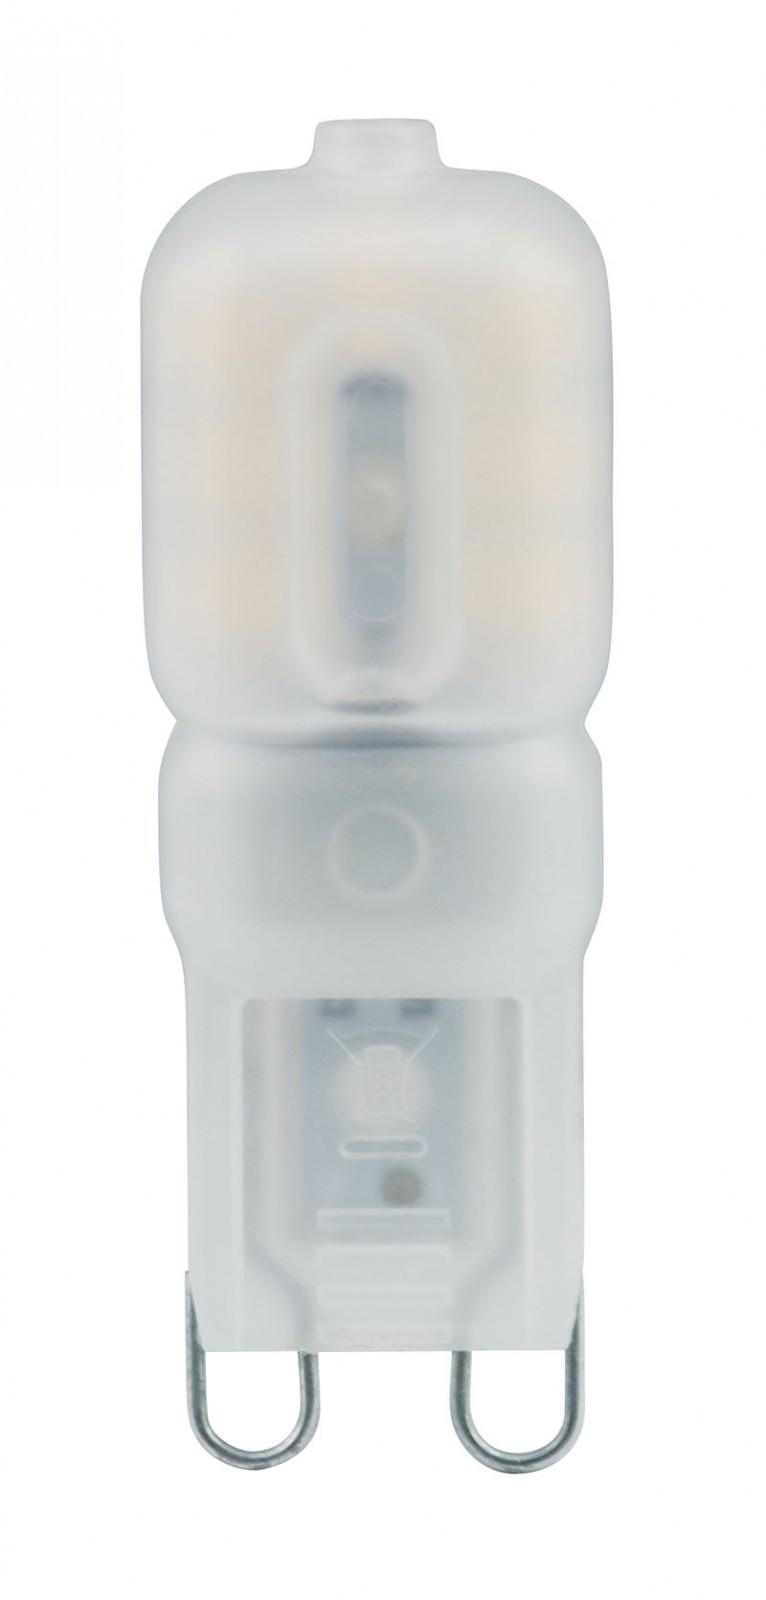 LANDLITE LED-G9/SXS-2.5W 2800K melegfehér, LED izzó